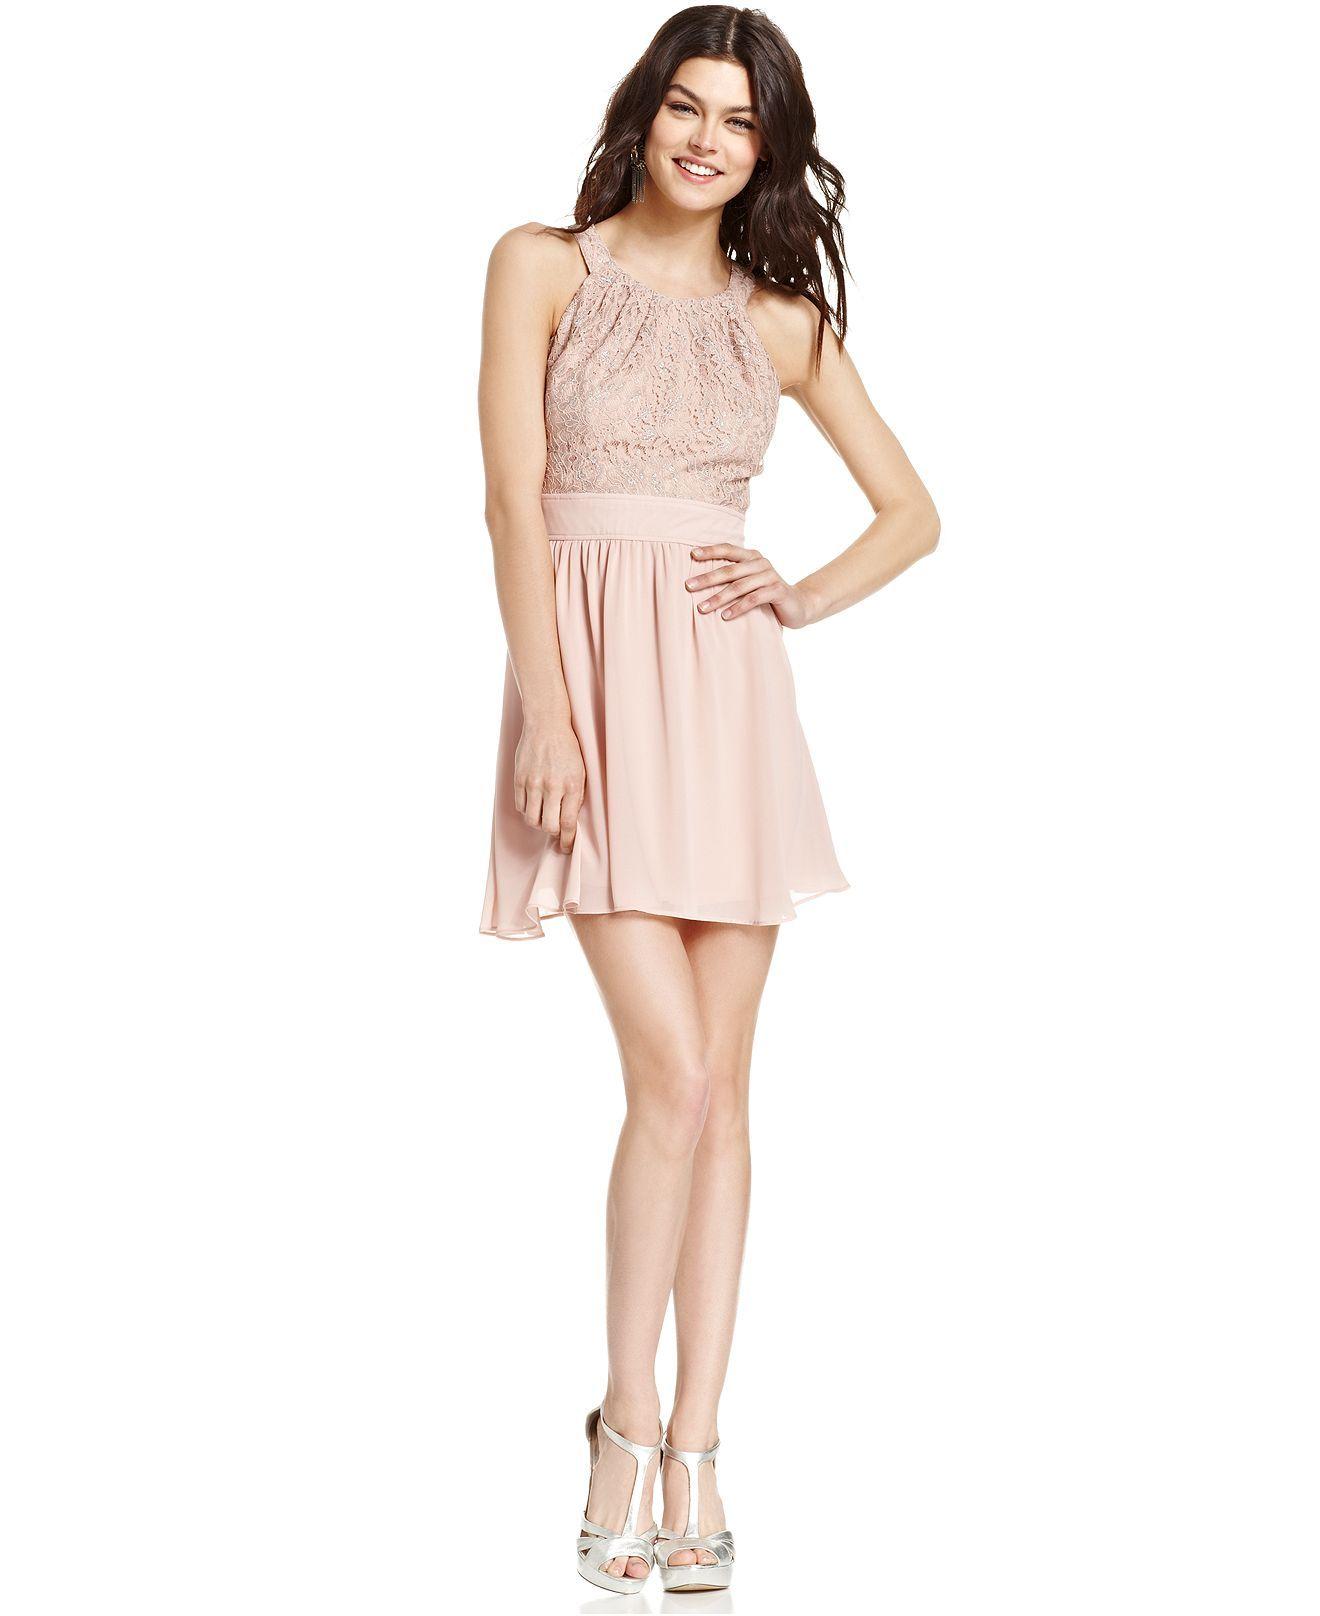 Beige Dresses for Juniors